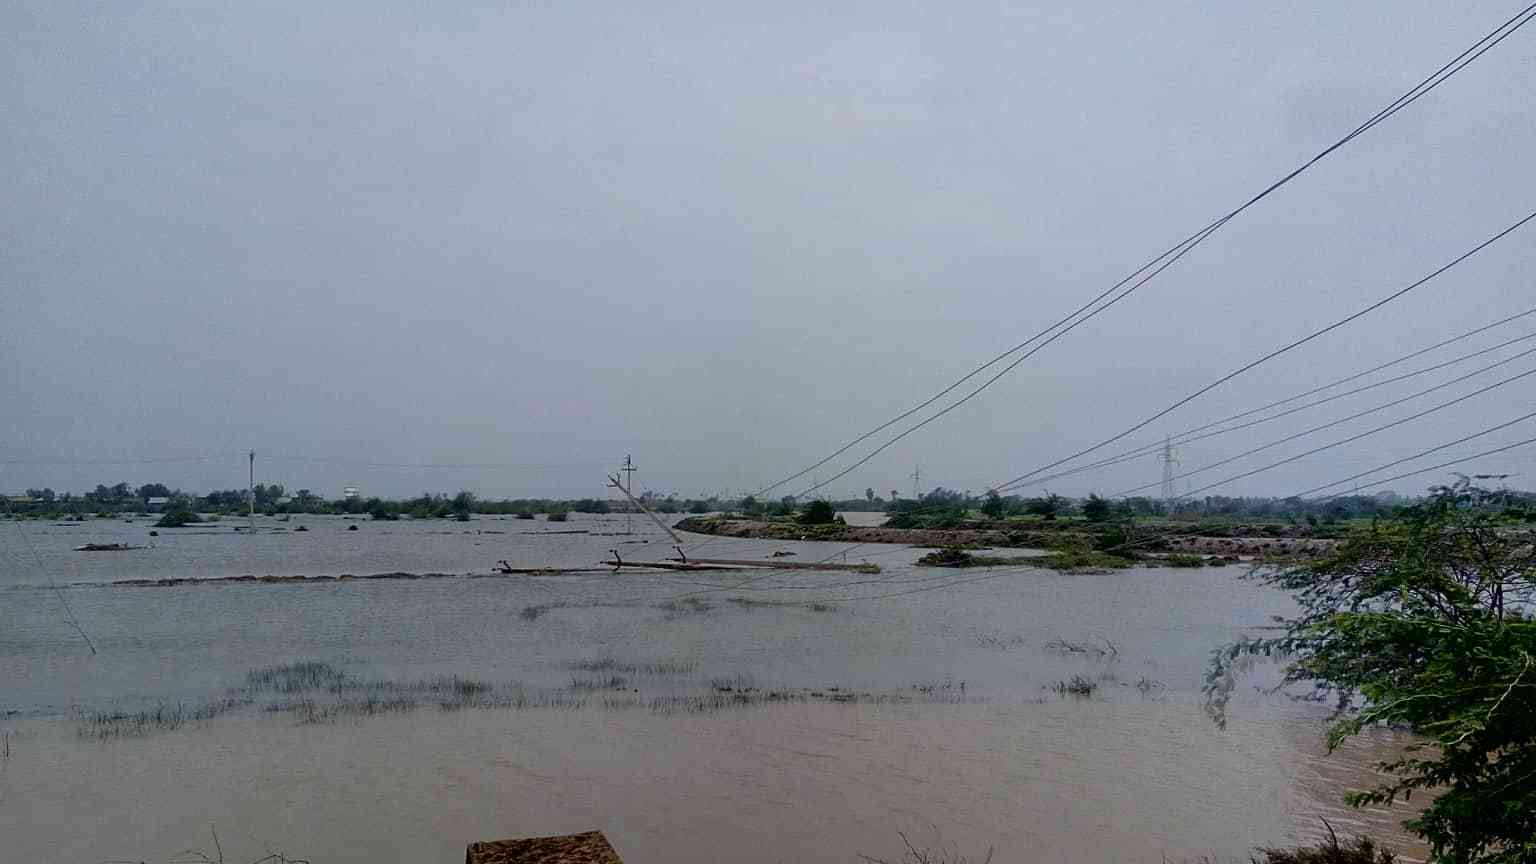 Damaged electrical poles in Nagapattinam (Photo credit: Revathi)